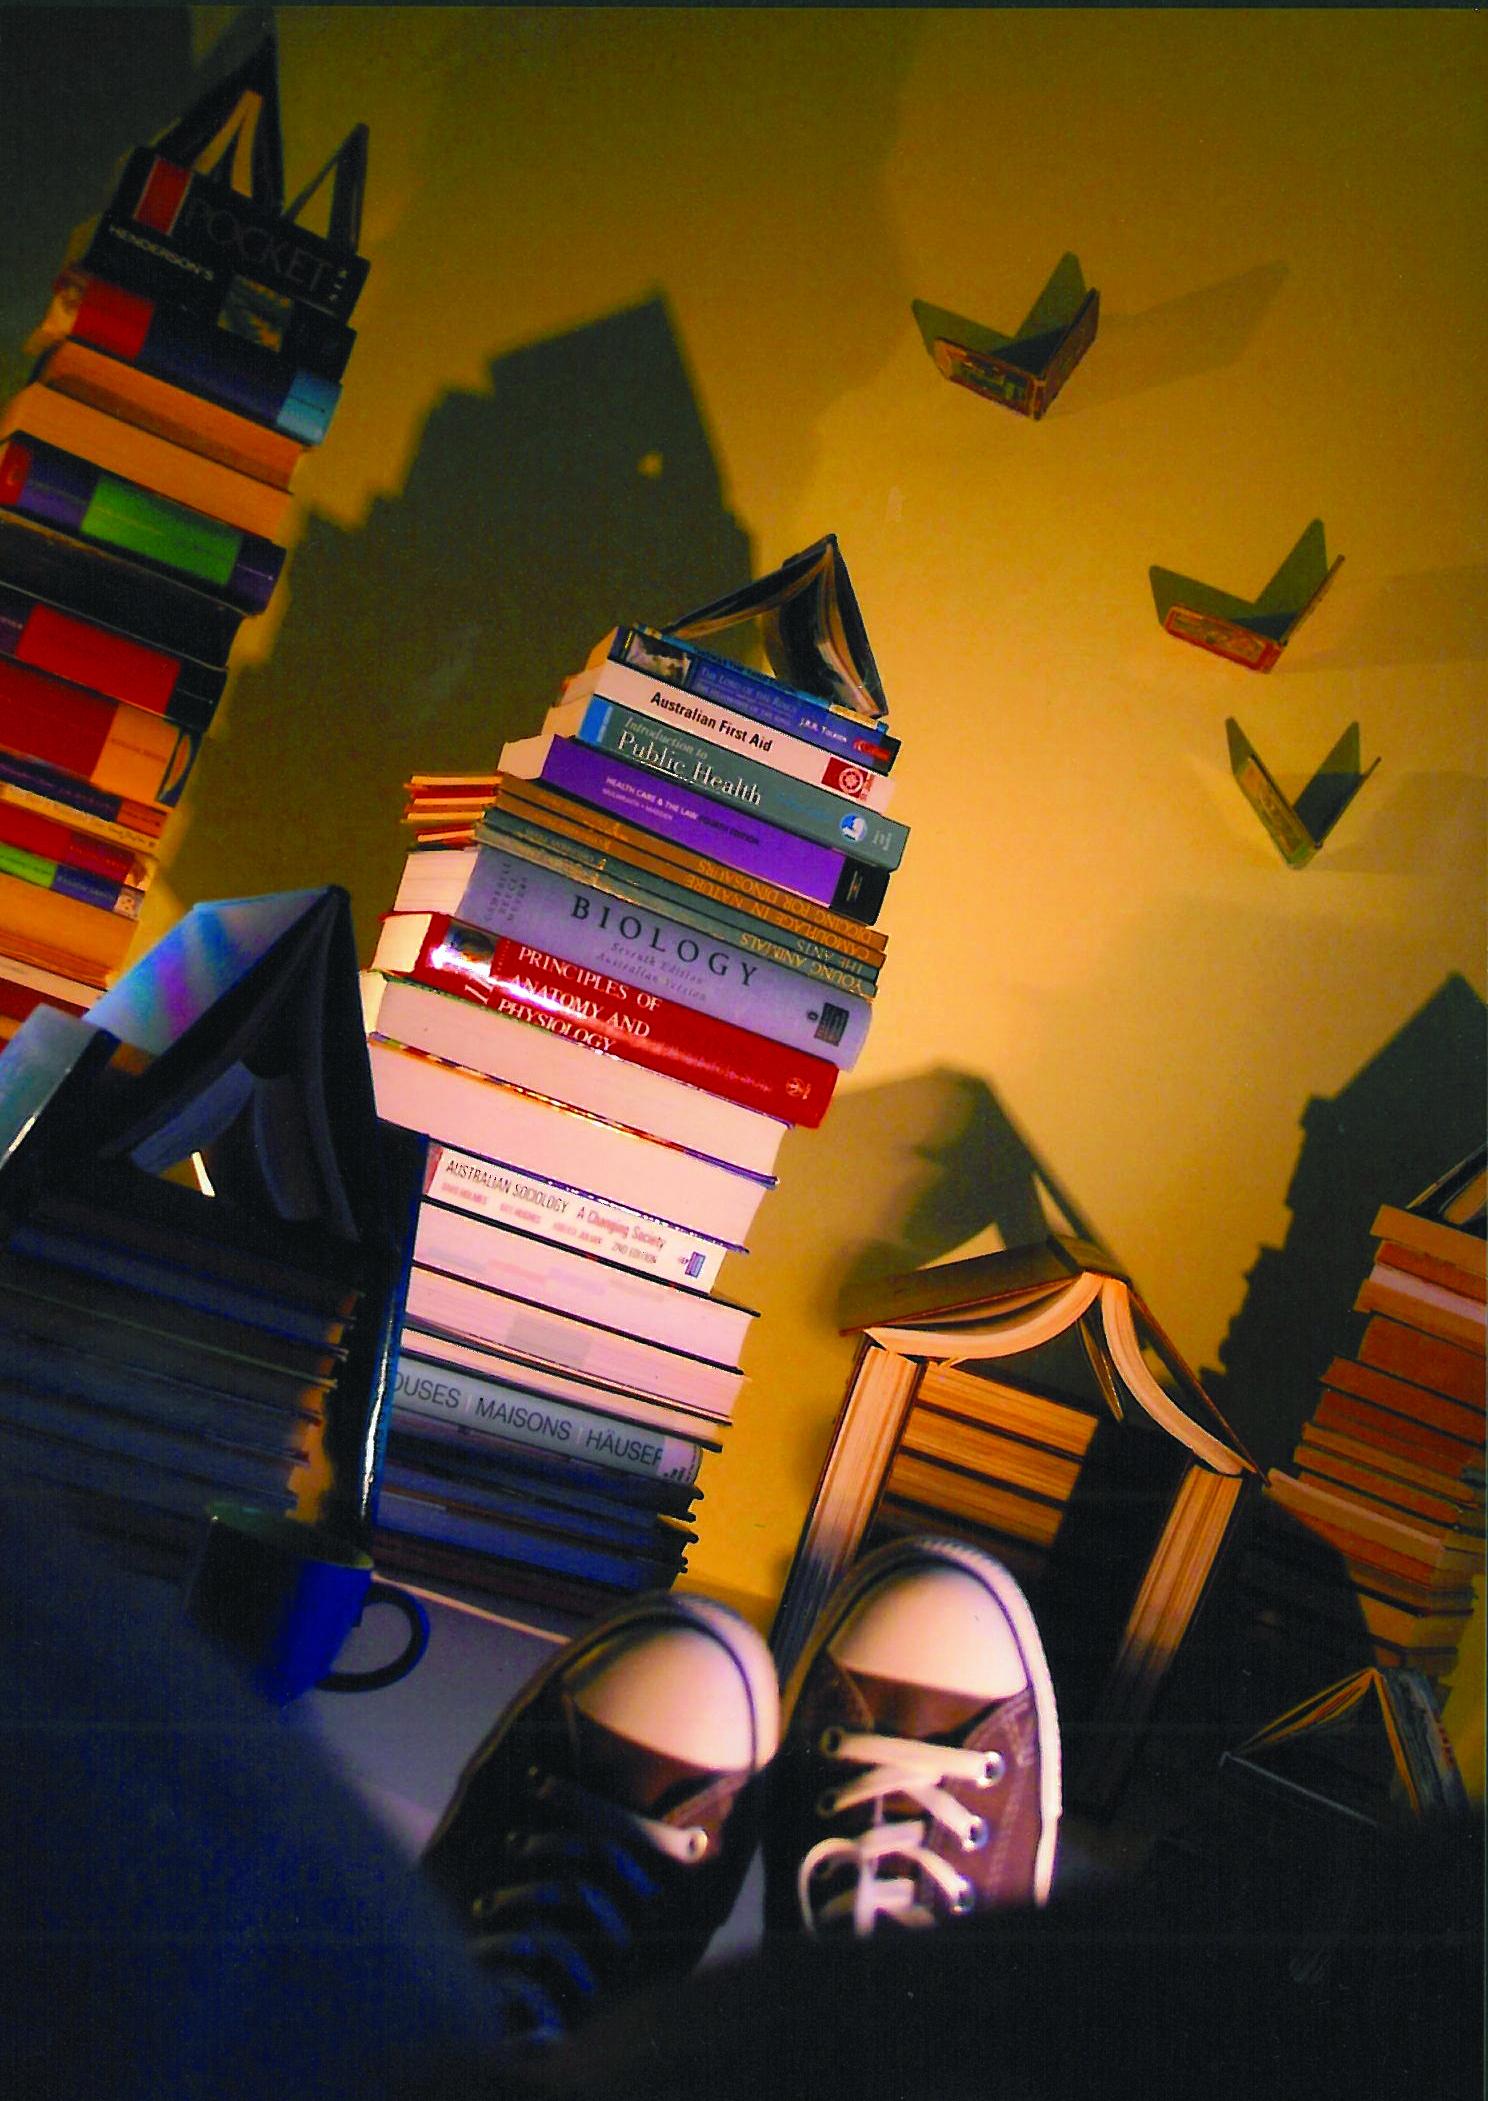 Staff Choice - 'Beyond the book'